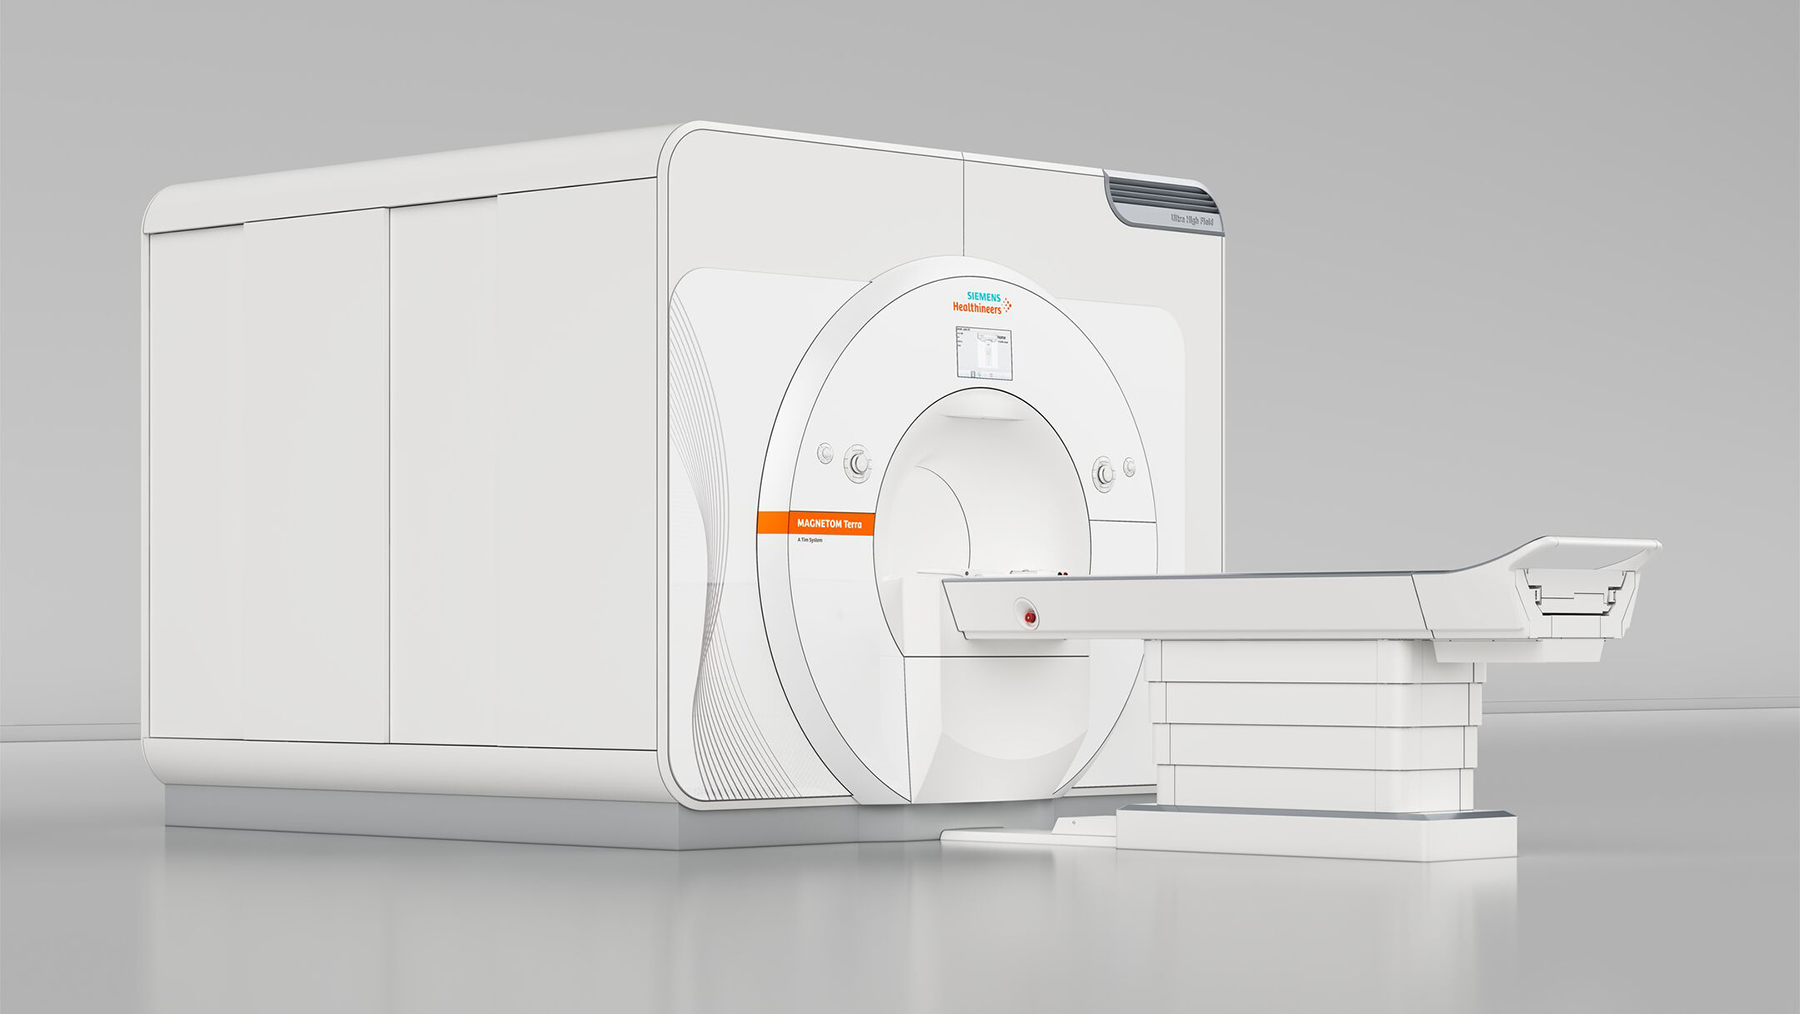 the 7 Tesla MRI machine